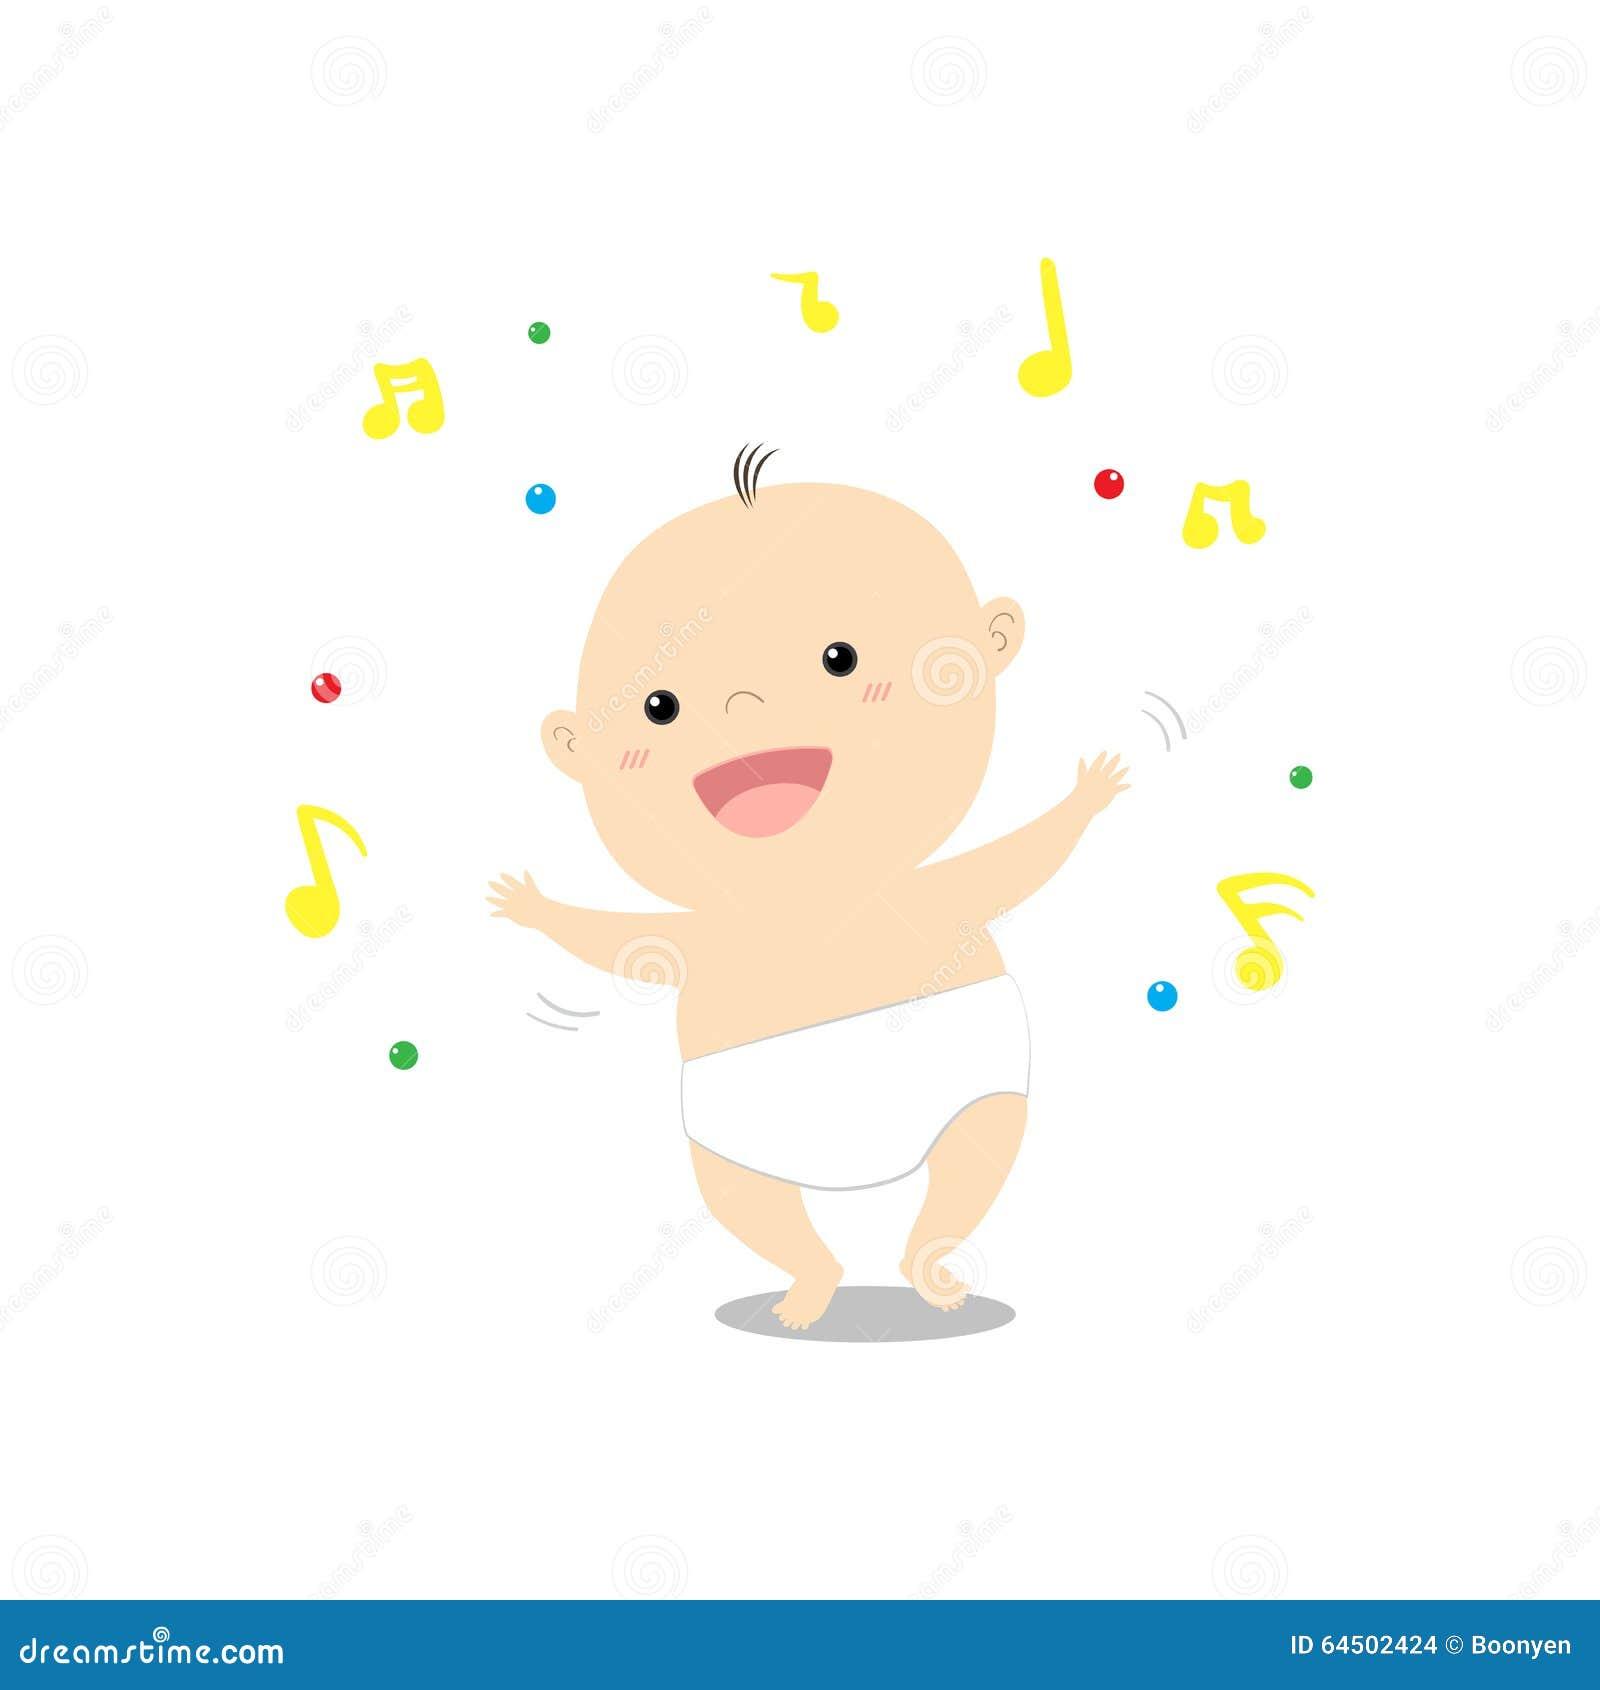 Dancing Dog Laughing Baby Video Download